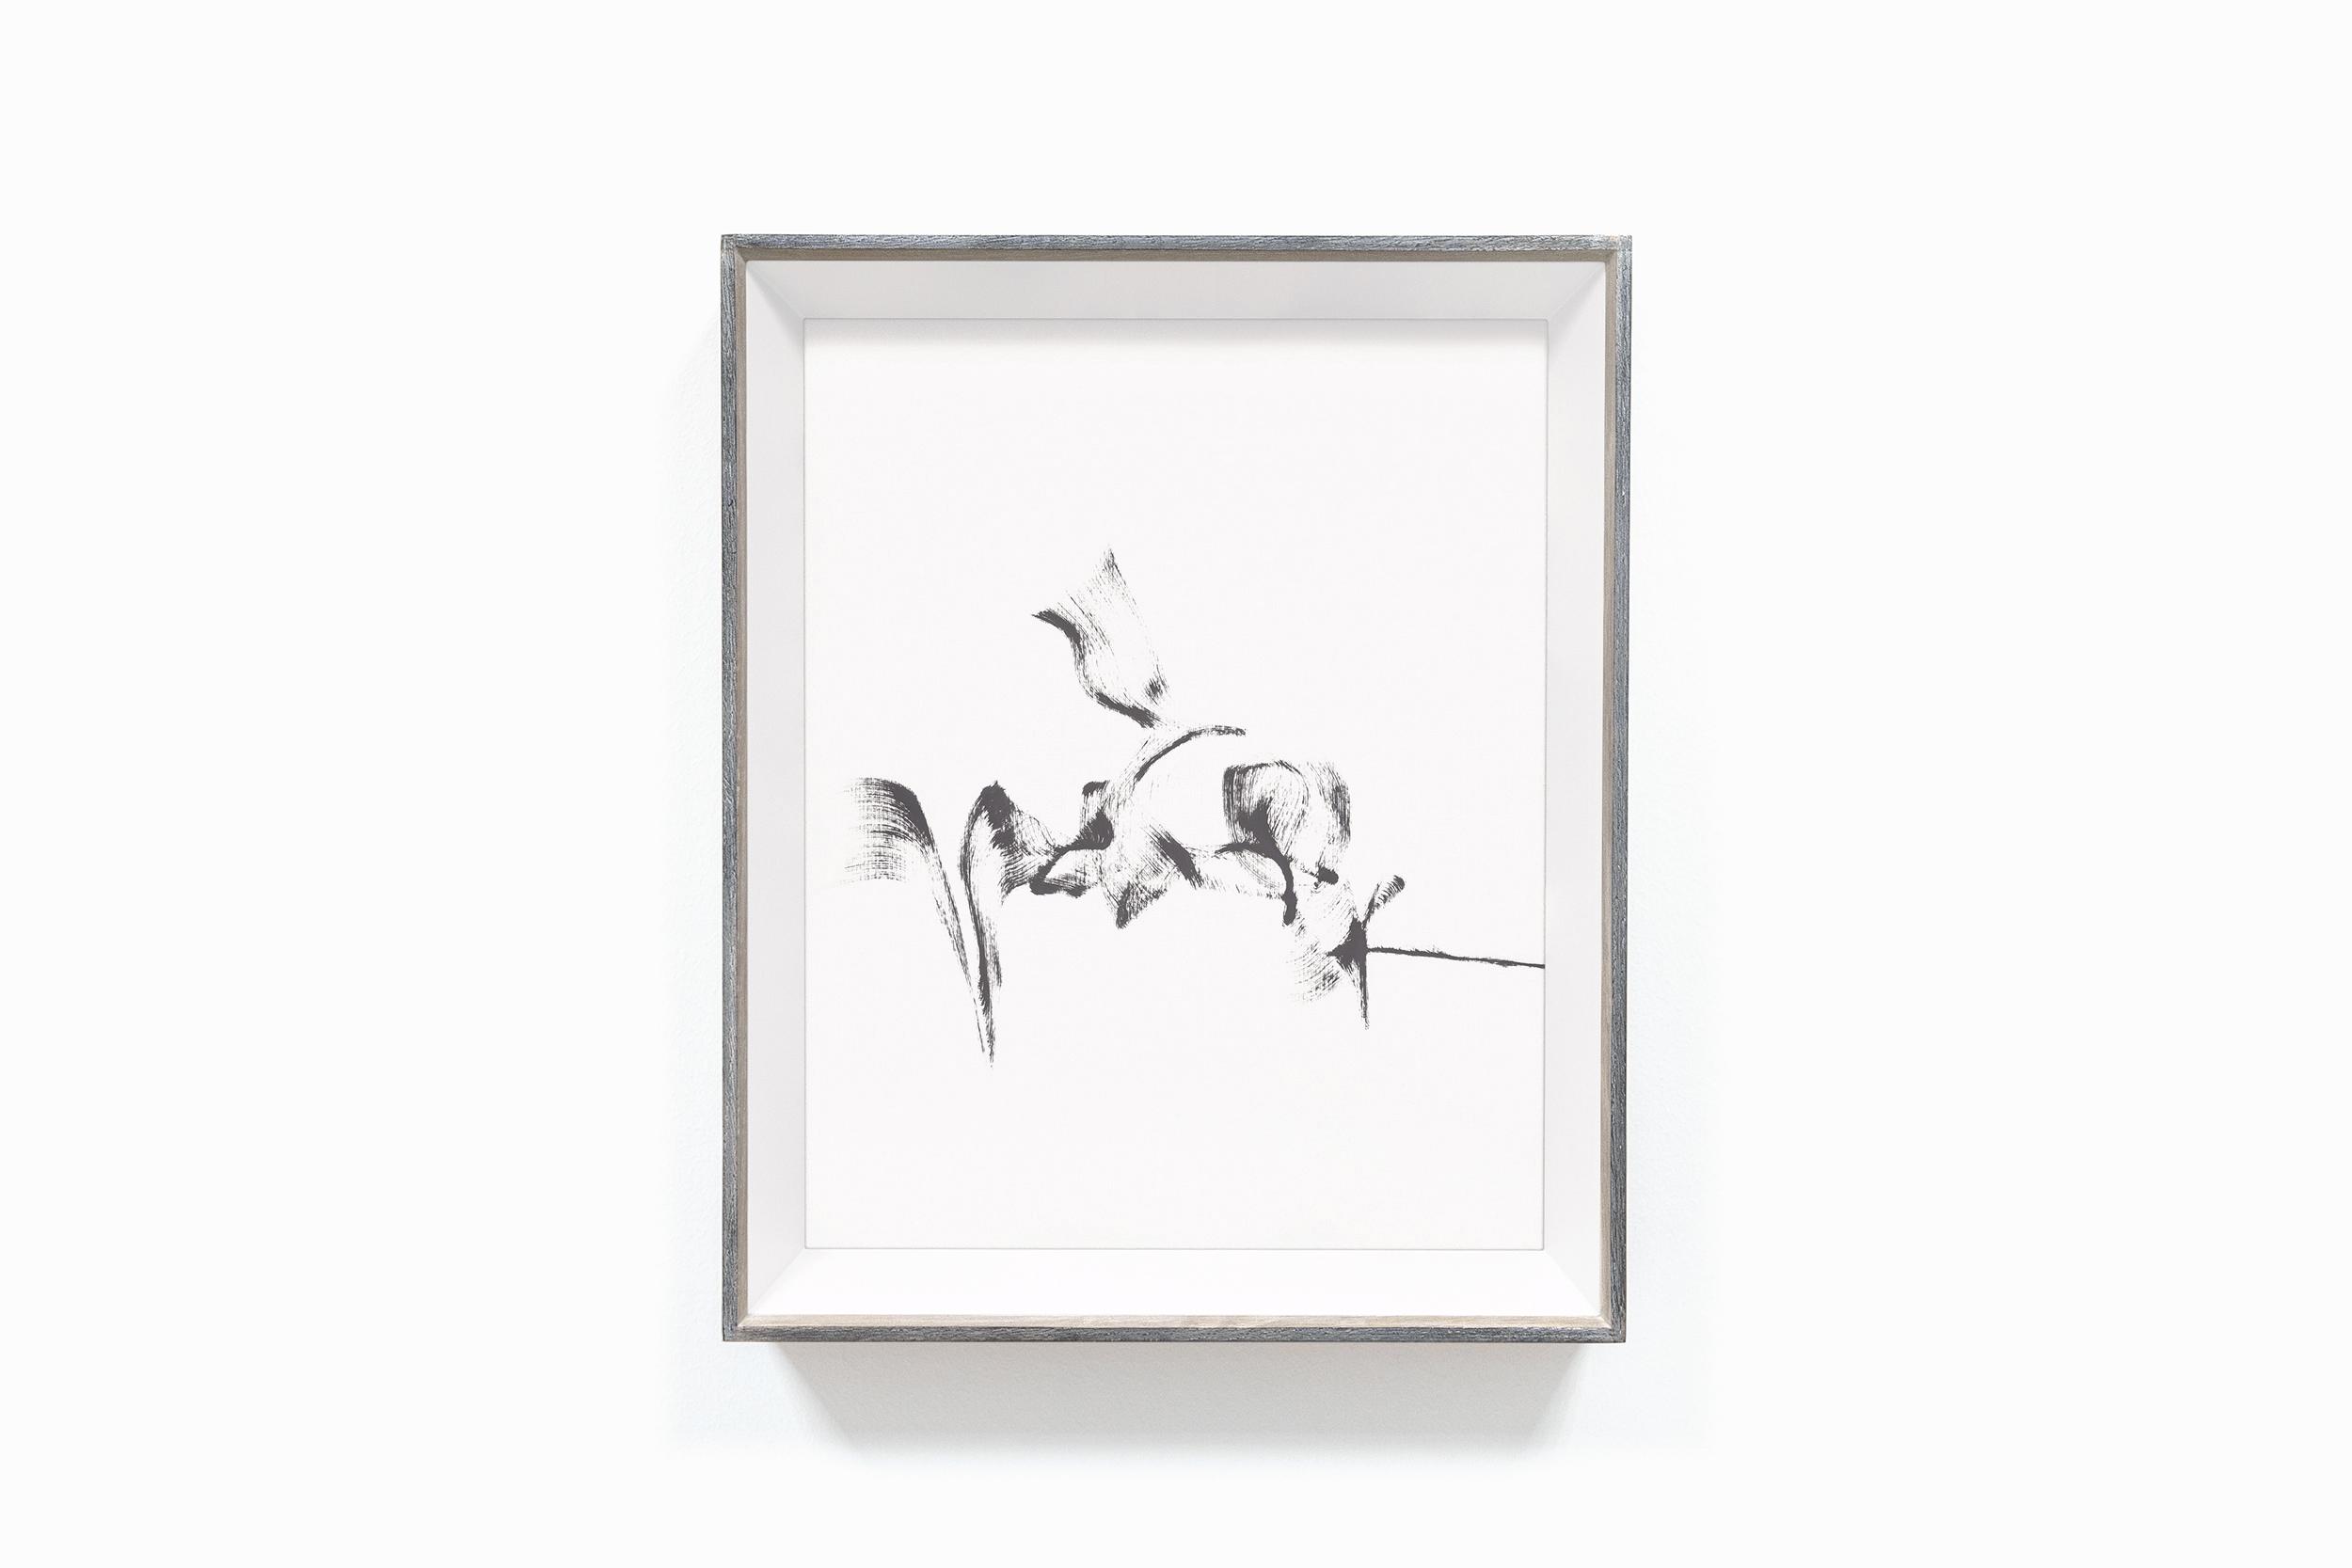 bonjourmolotov Deambulaia Exhibition 40x50 Illustration Ilustracao painting pintura acrylic acrílico canvas tela paper cardboard mdf Andre Gigante 06N6.jpg